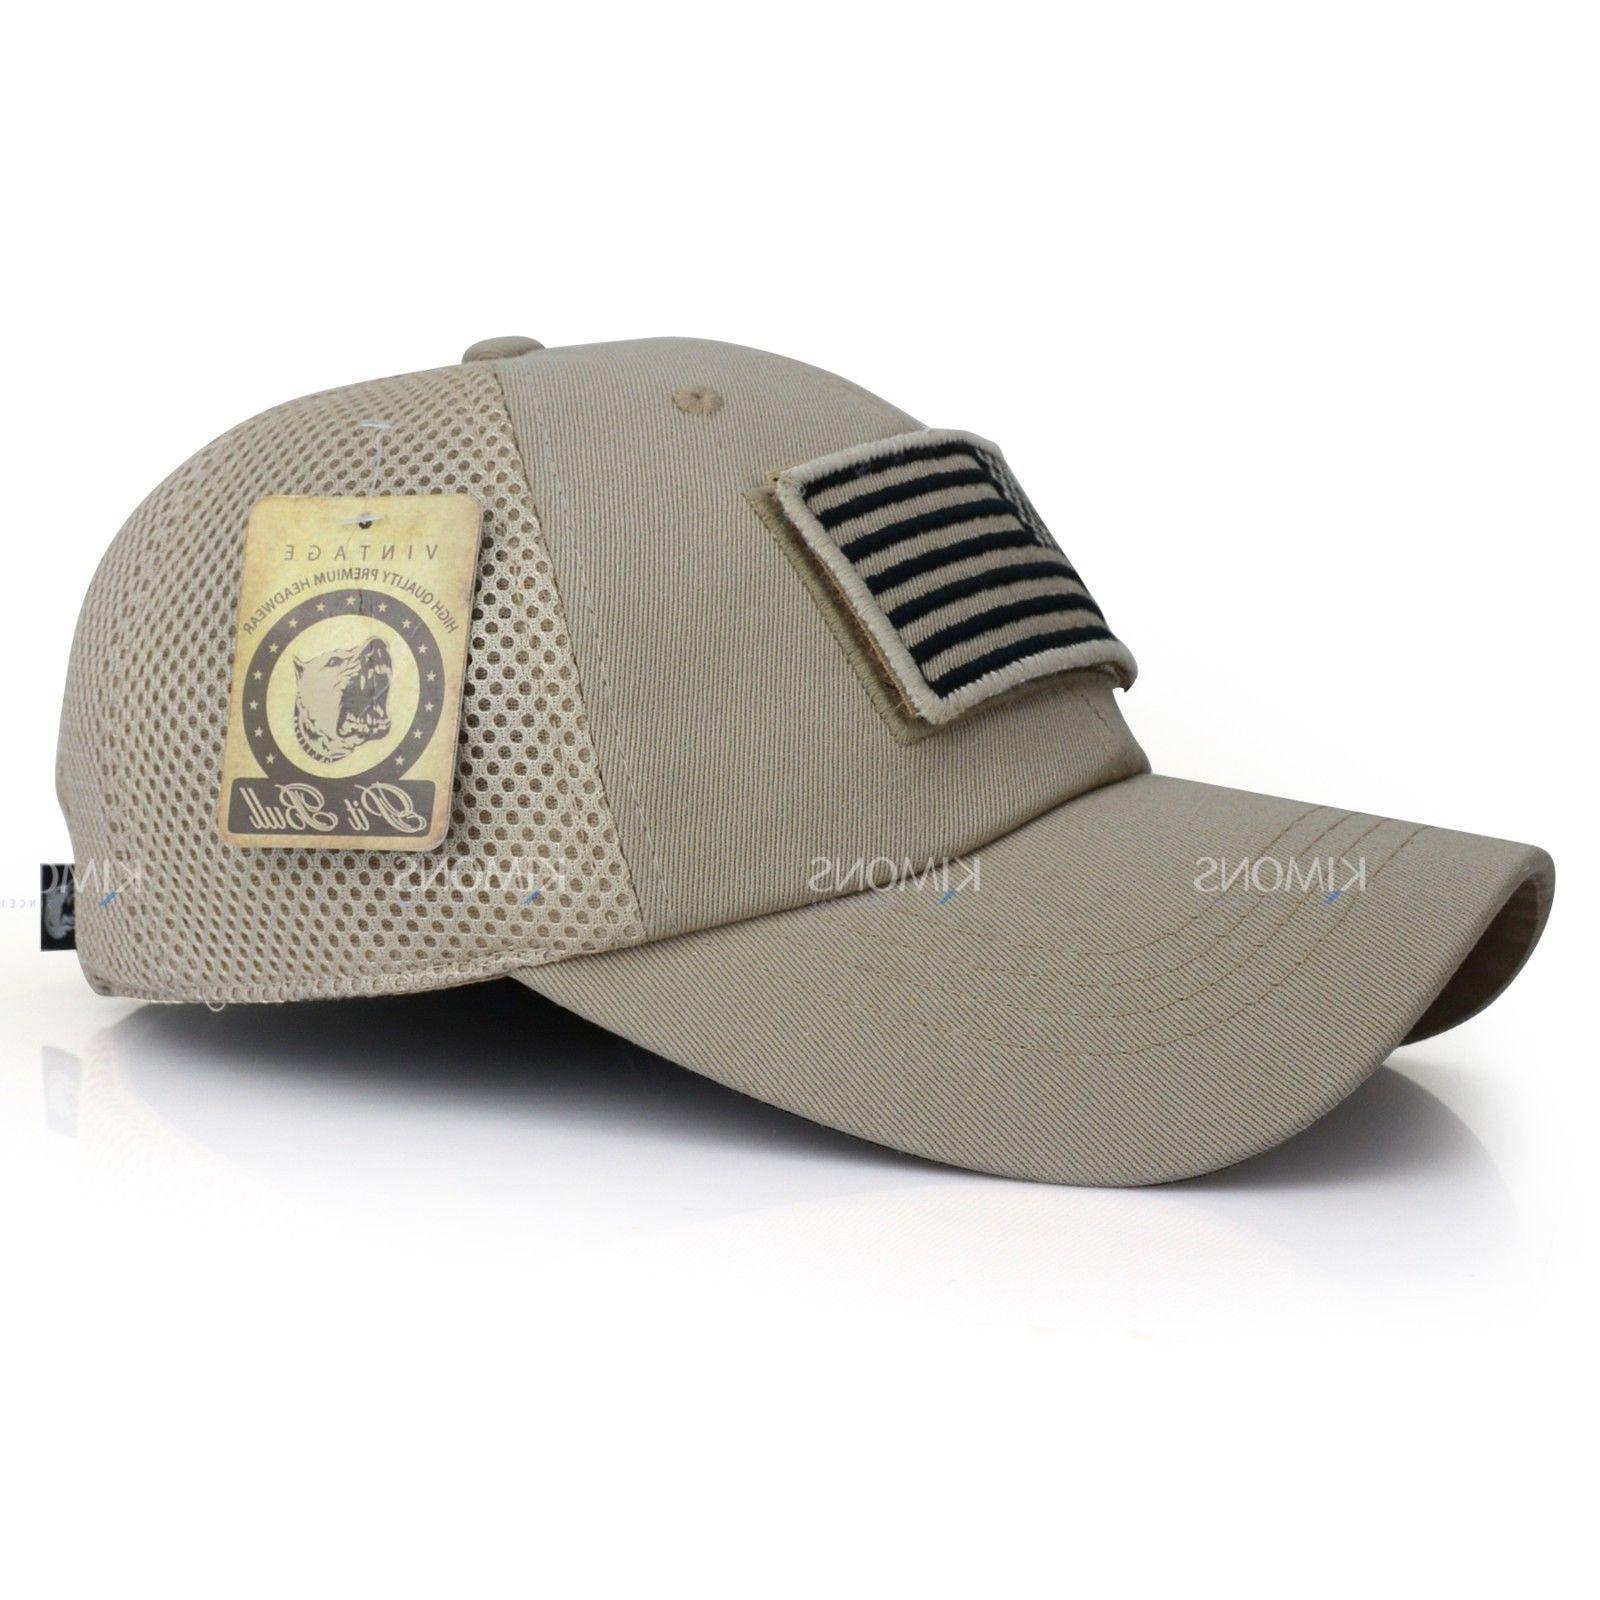 USA hat Detachable Baseball Military Army US Cotton